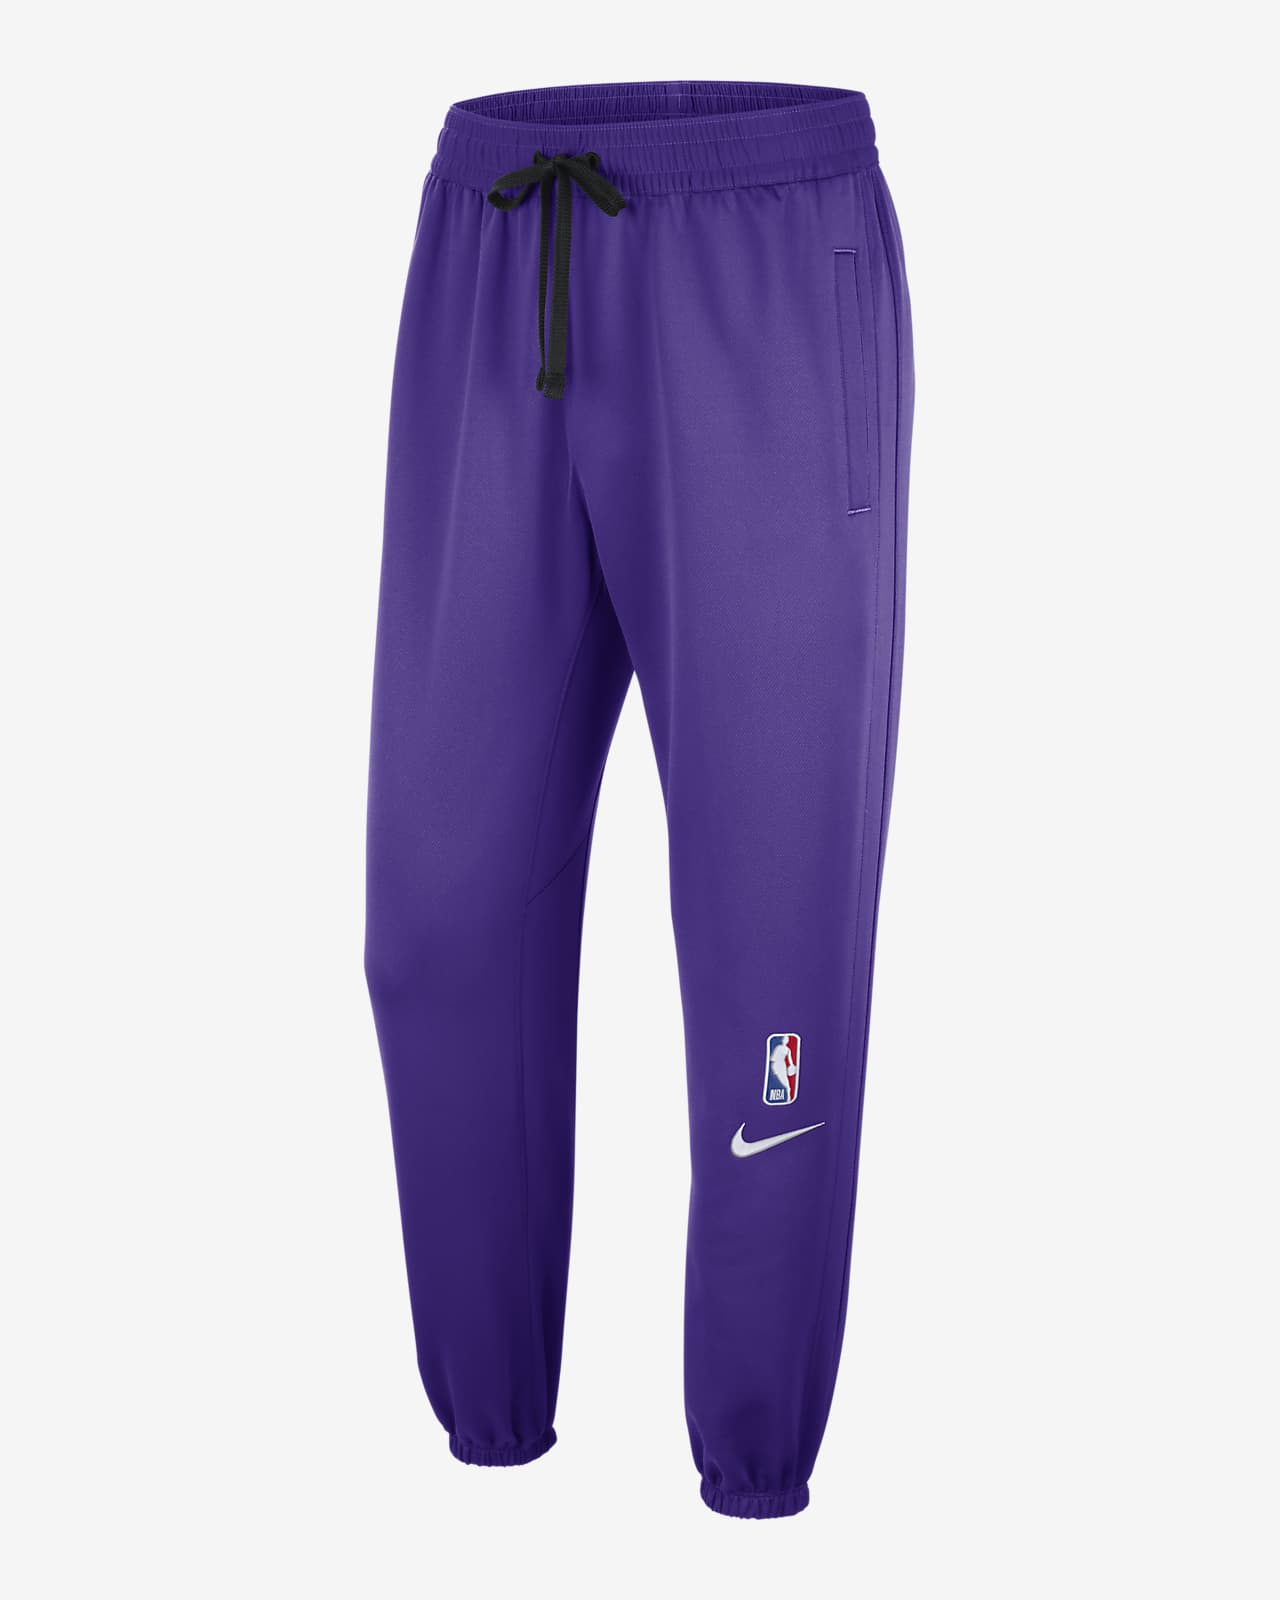 Pantalon NBA Nike Therma Flex Los Angeles Lakers Showtime pour Homme